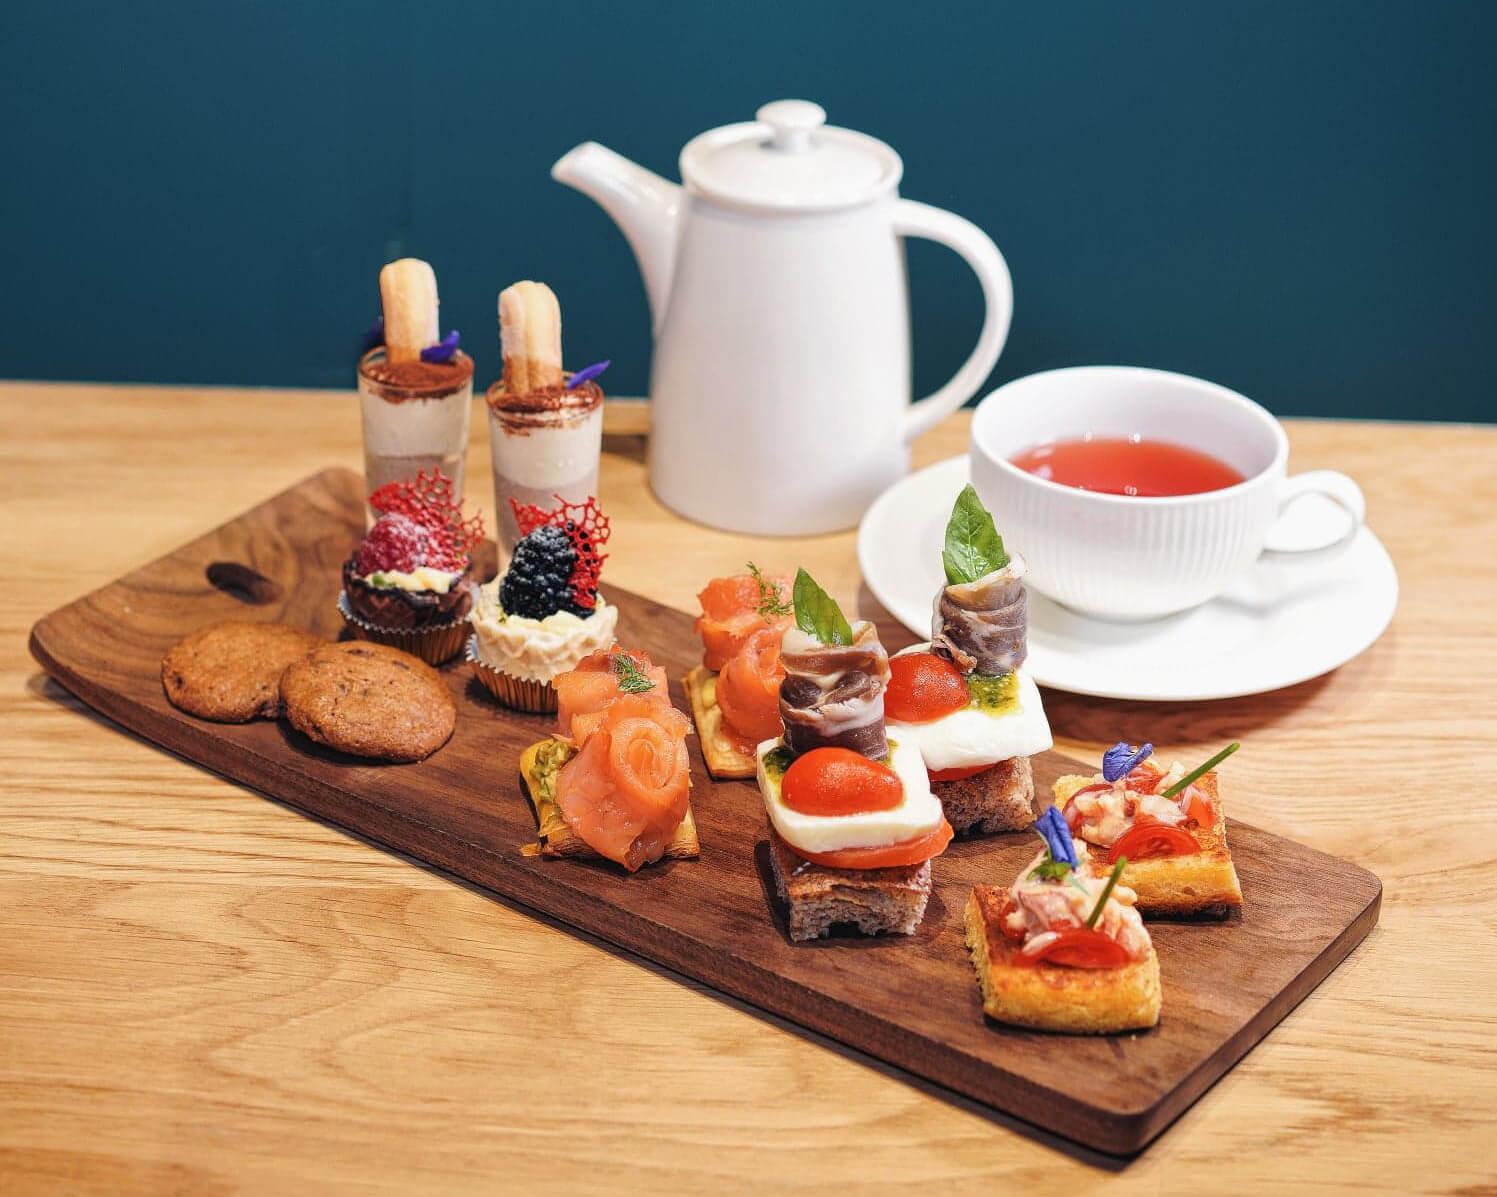 意式下午茶 Da Dolomites HK$328(2位)。